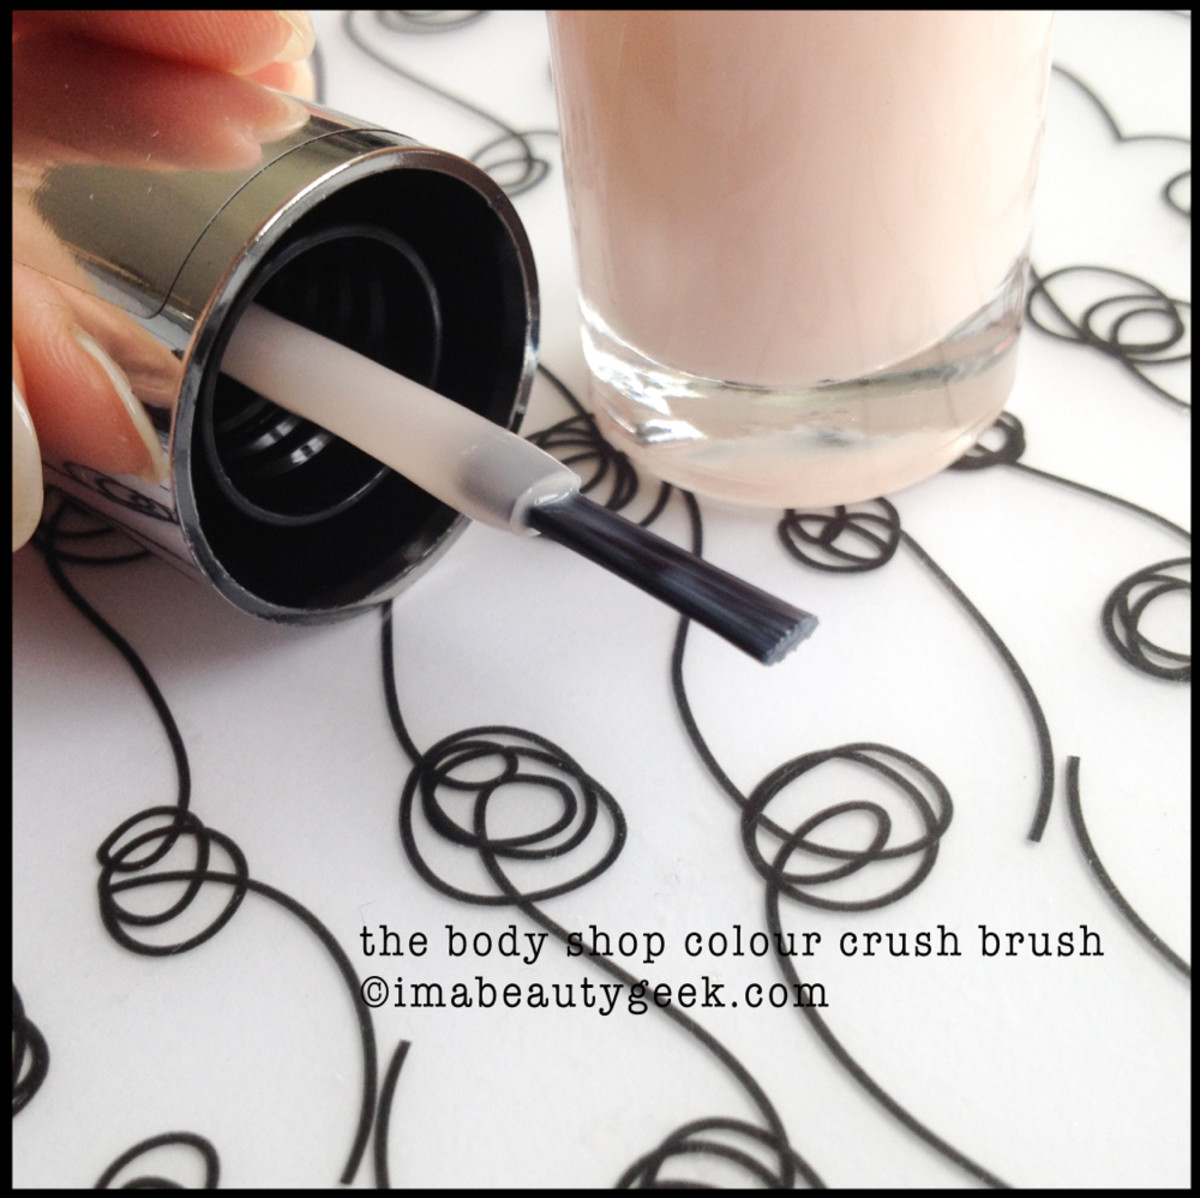 Body Shop Colour Crush Brush